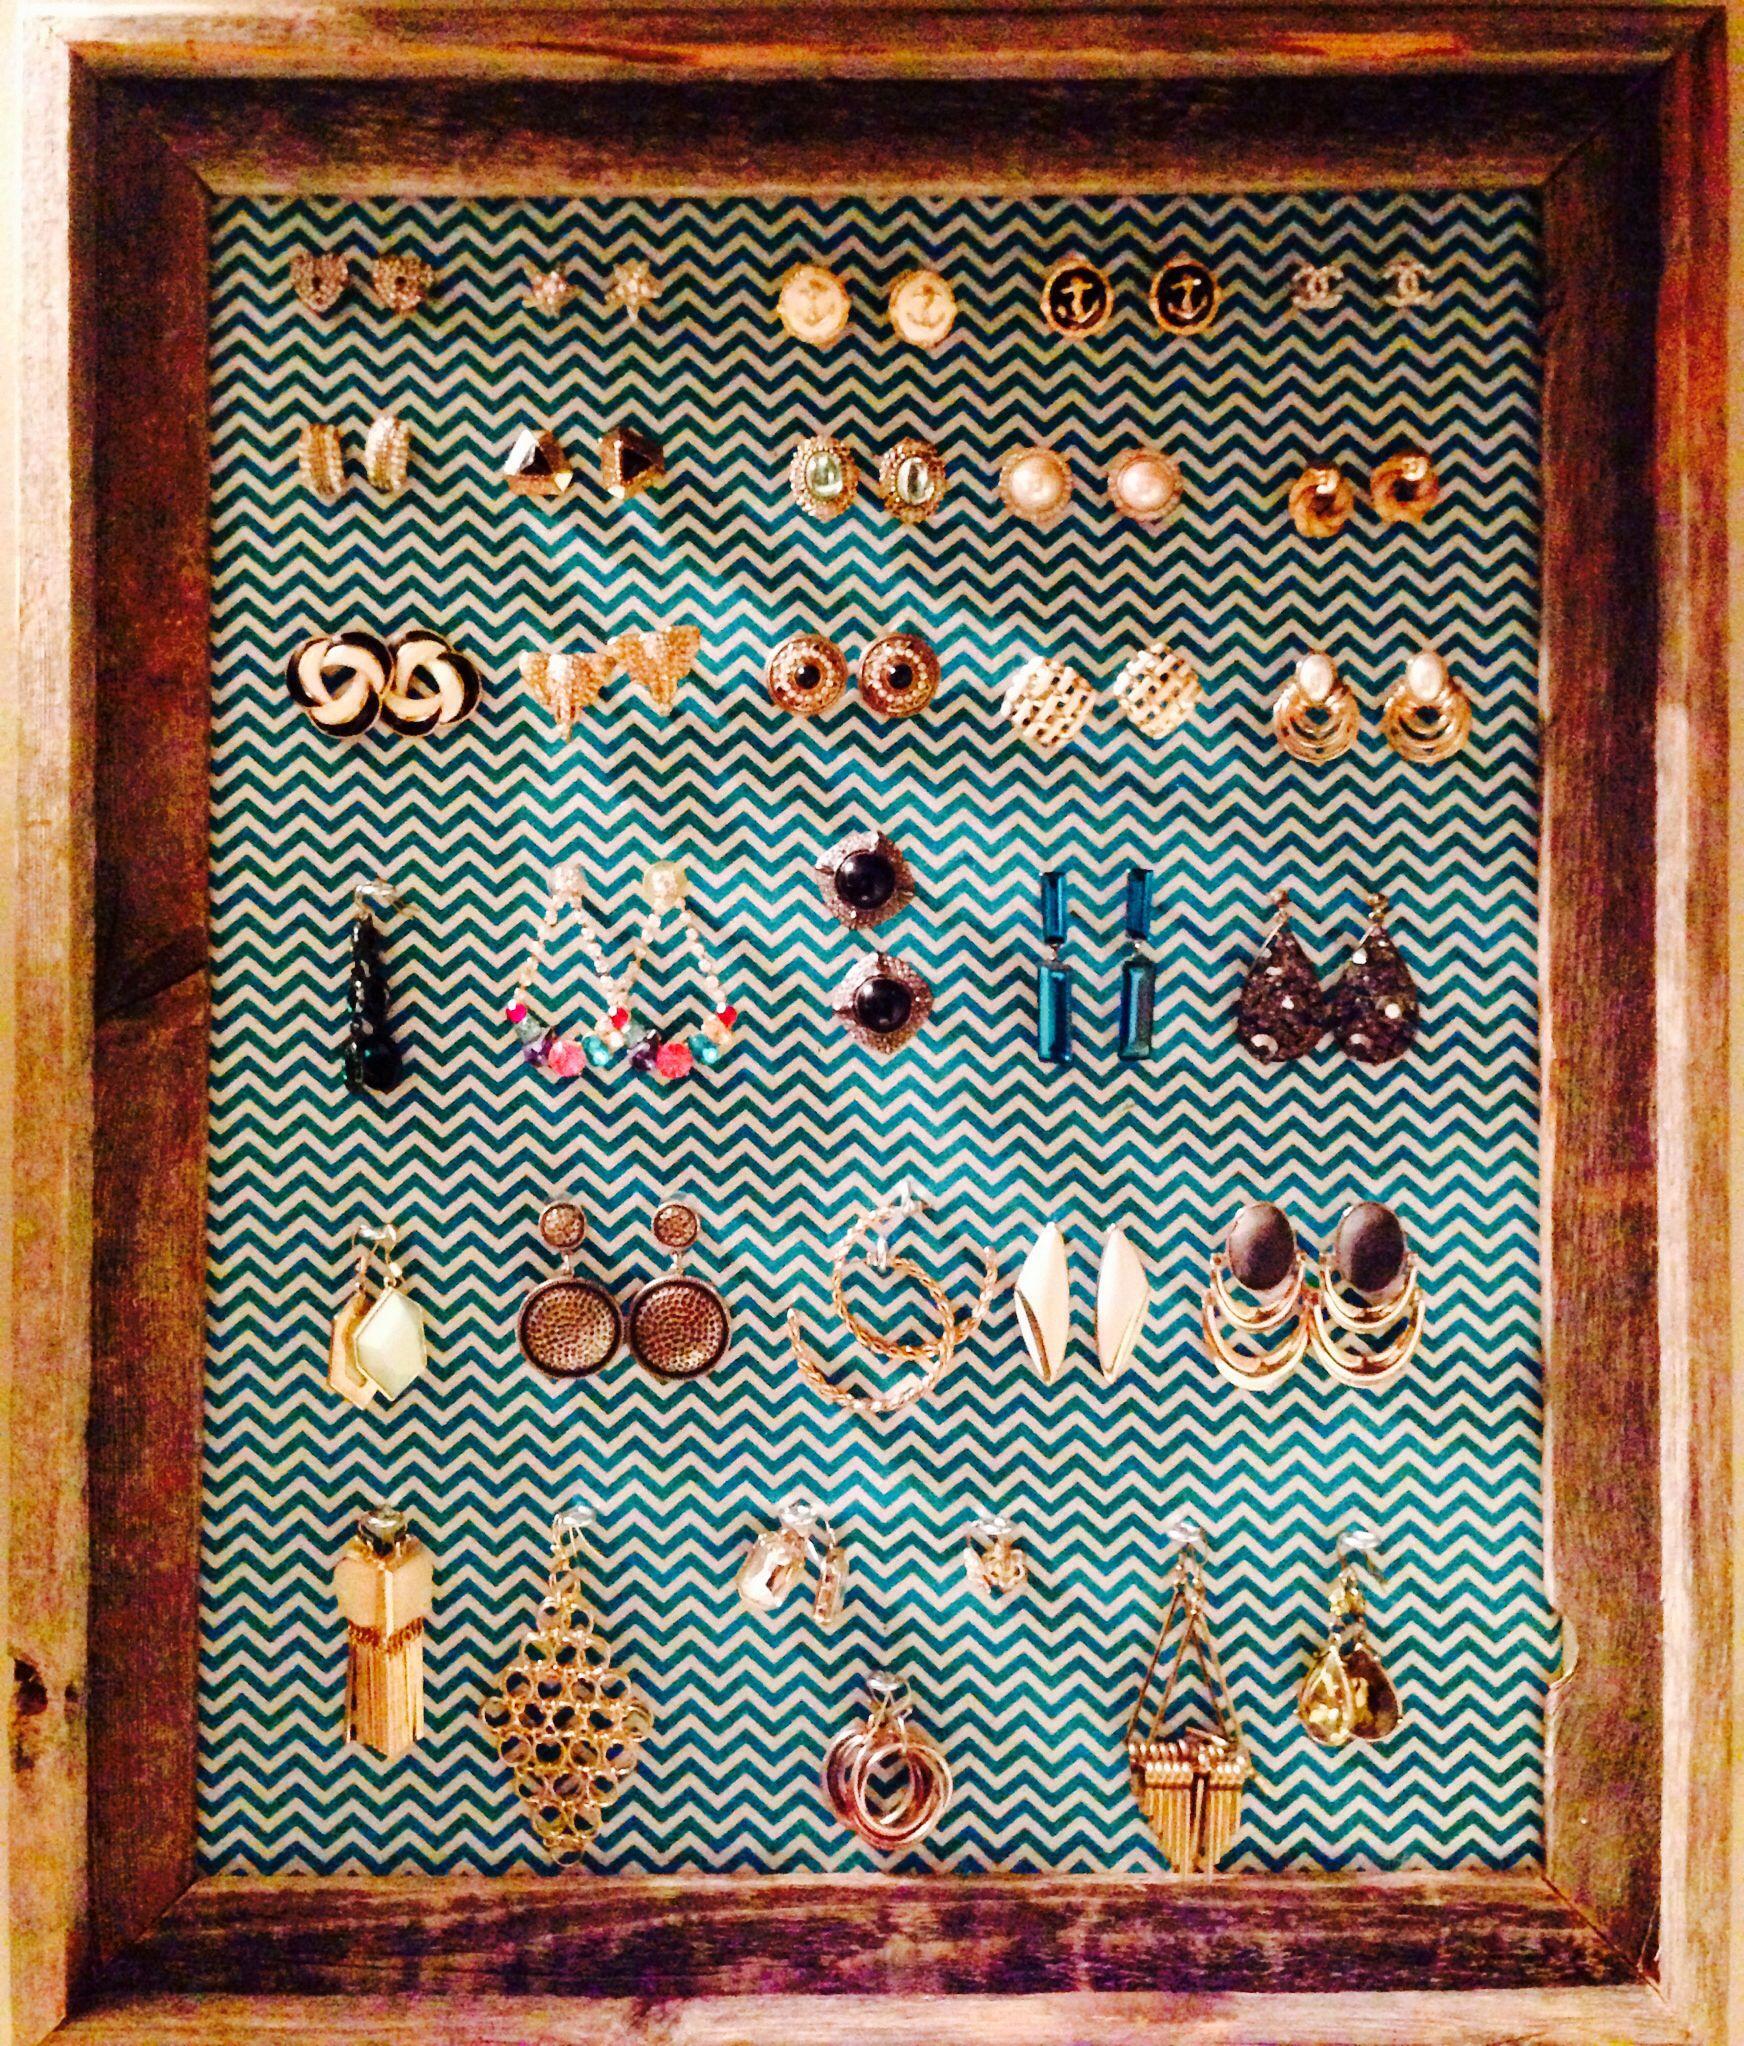 Framed Cork Board Earring Display